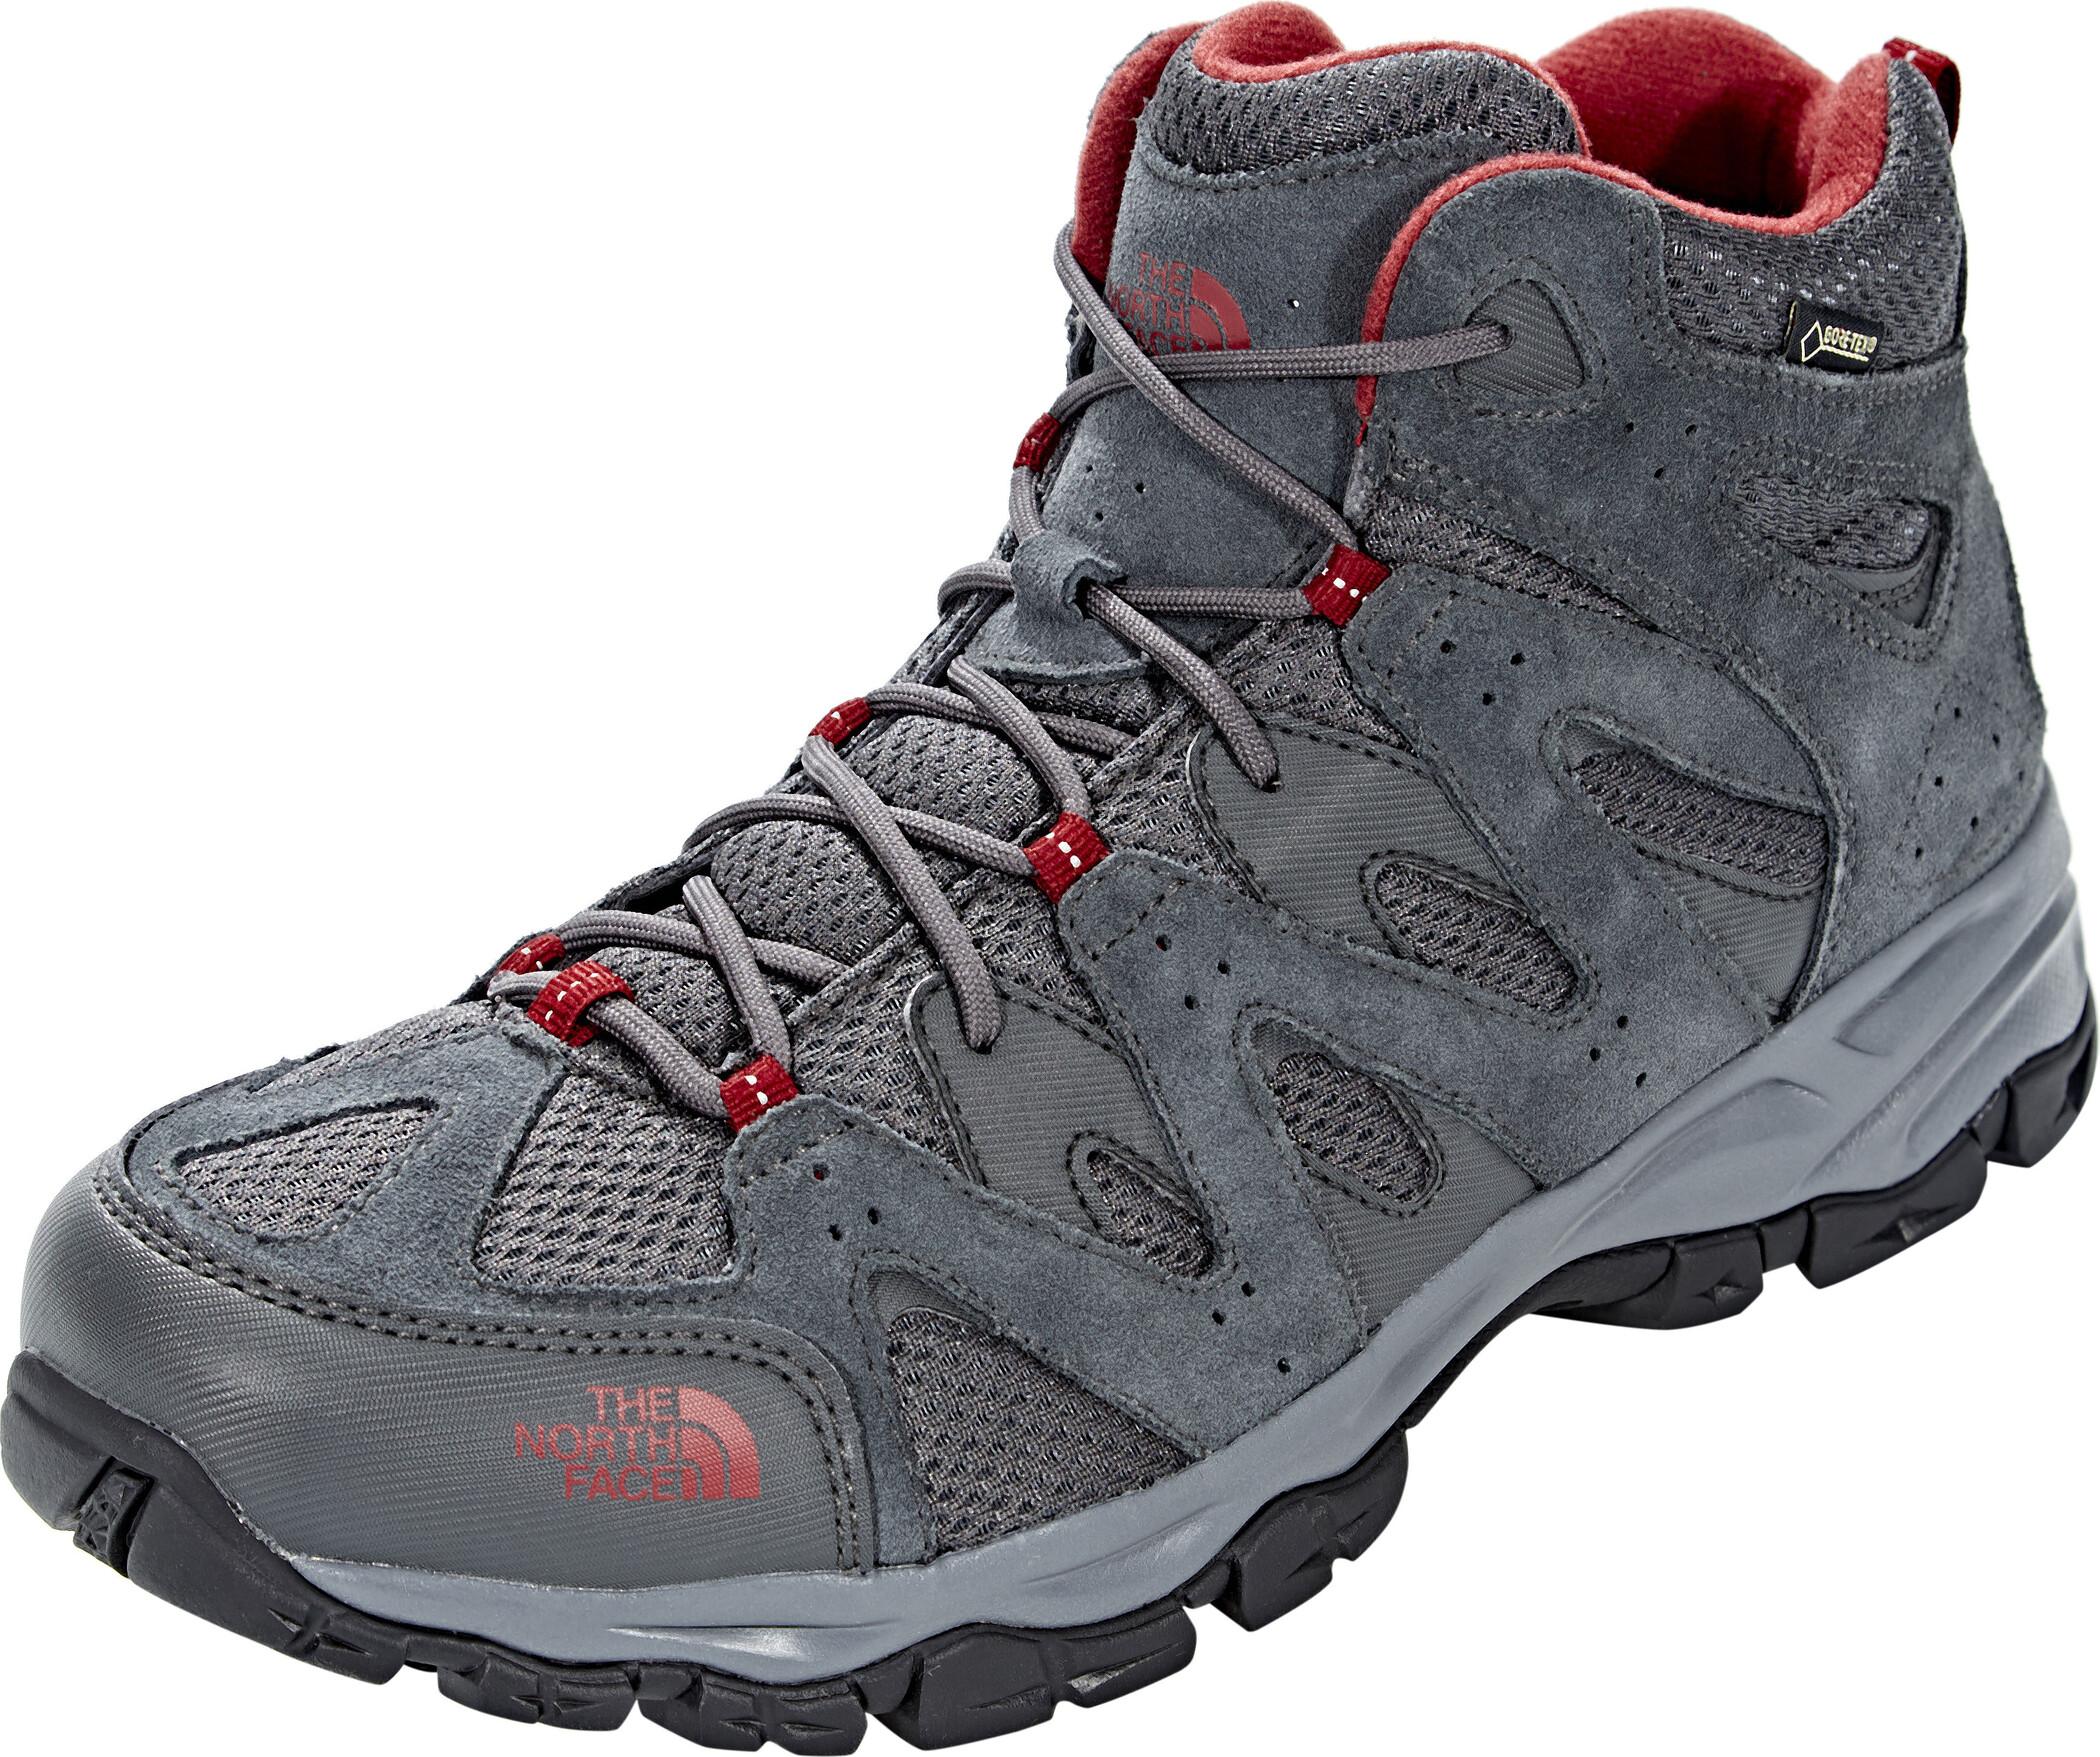 sale retailer cf874 0583f The North Face Storm Hike Mid GTX Shoes Men Dark Shadow Grey Rudy Red.jpg